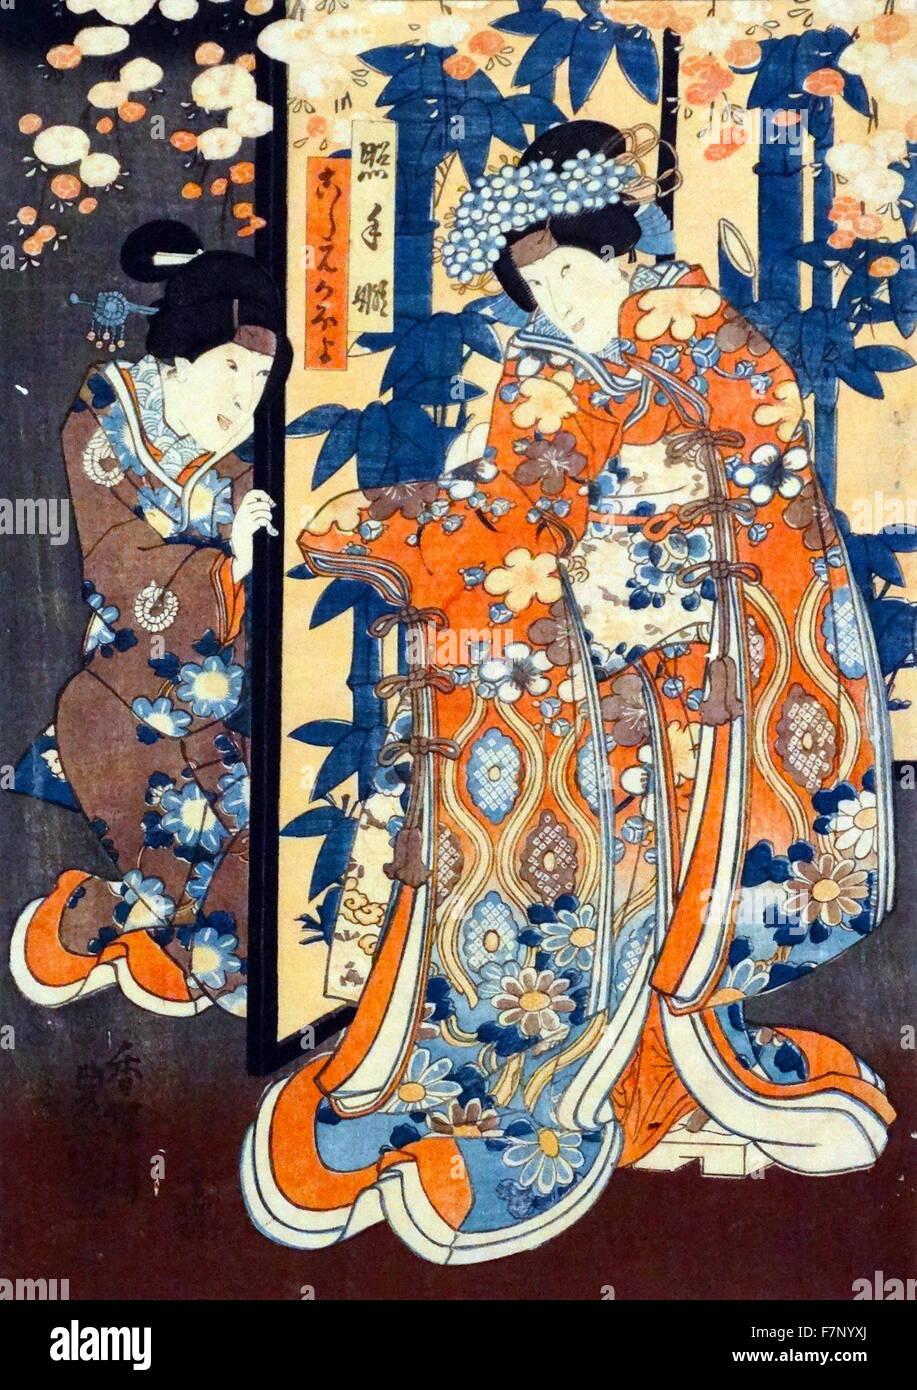 Terutekime and Koshimoto Kaoyo by Utagawa Kunisada (1786-1865) Japanese designer of ukiyo-e woodblock prints. Dated - Stock Image